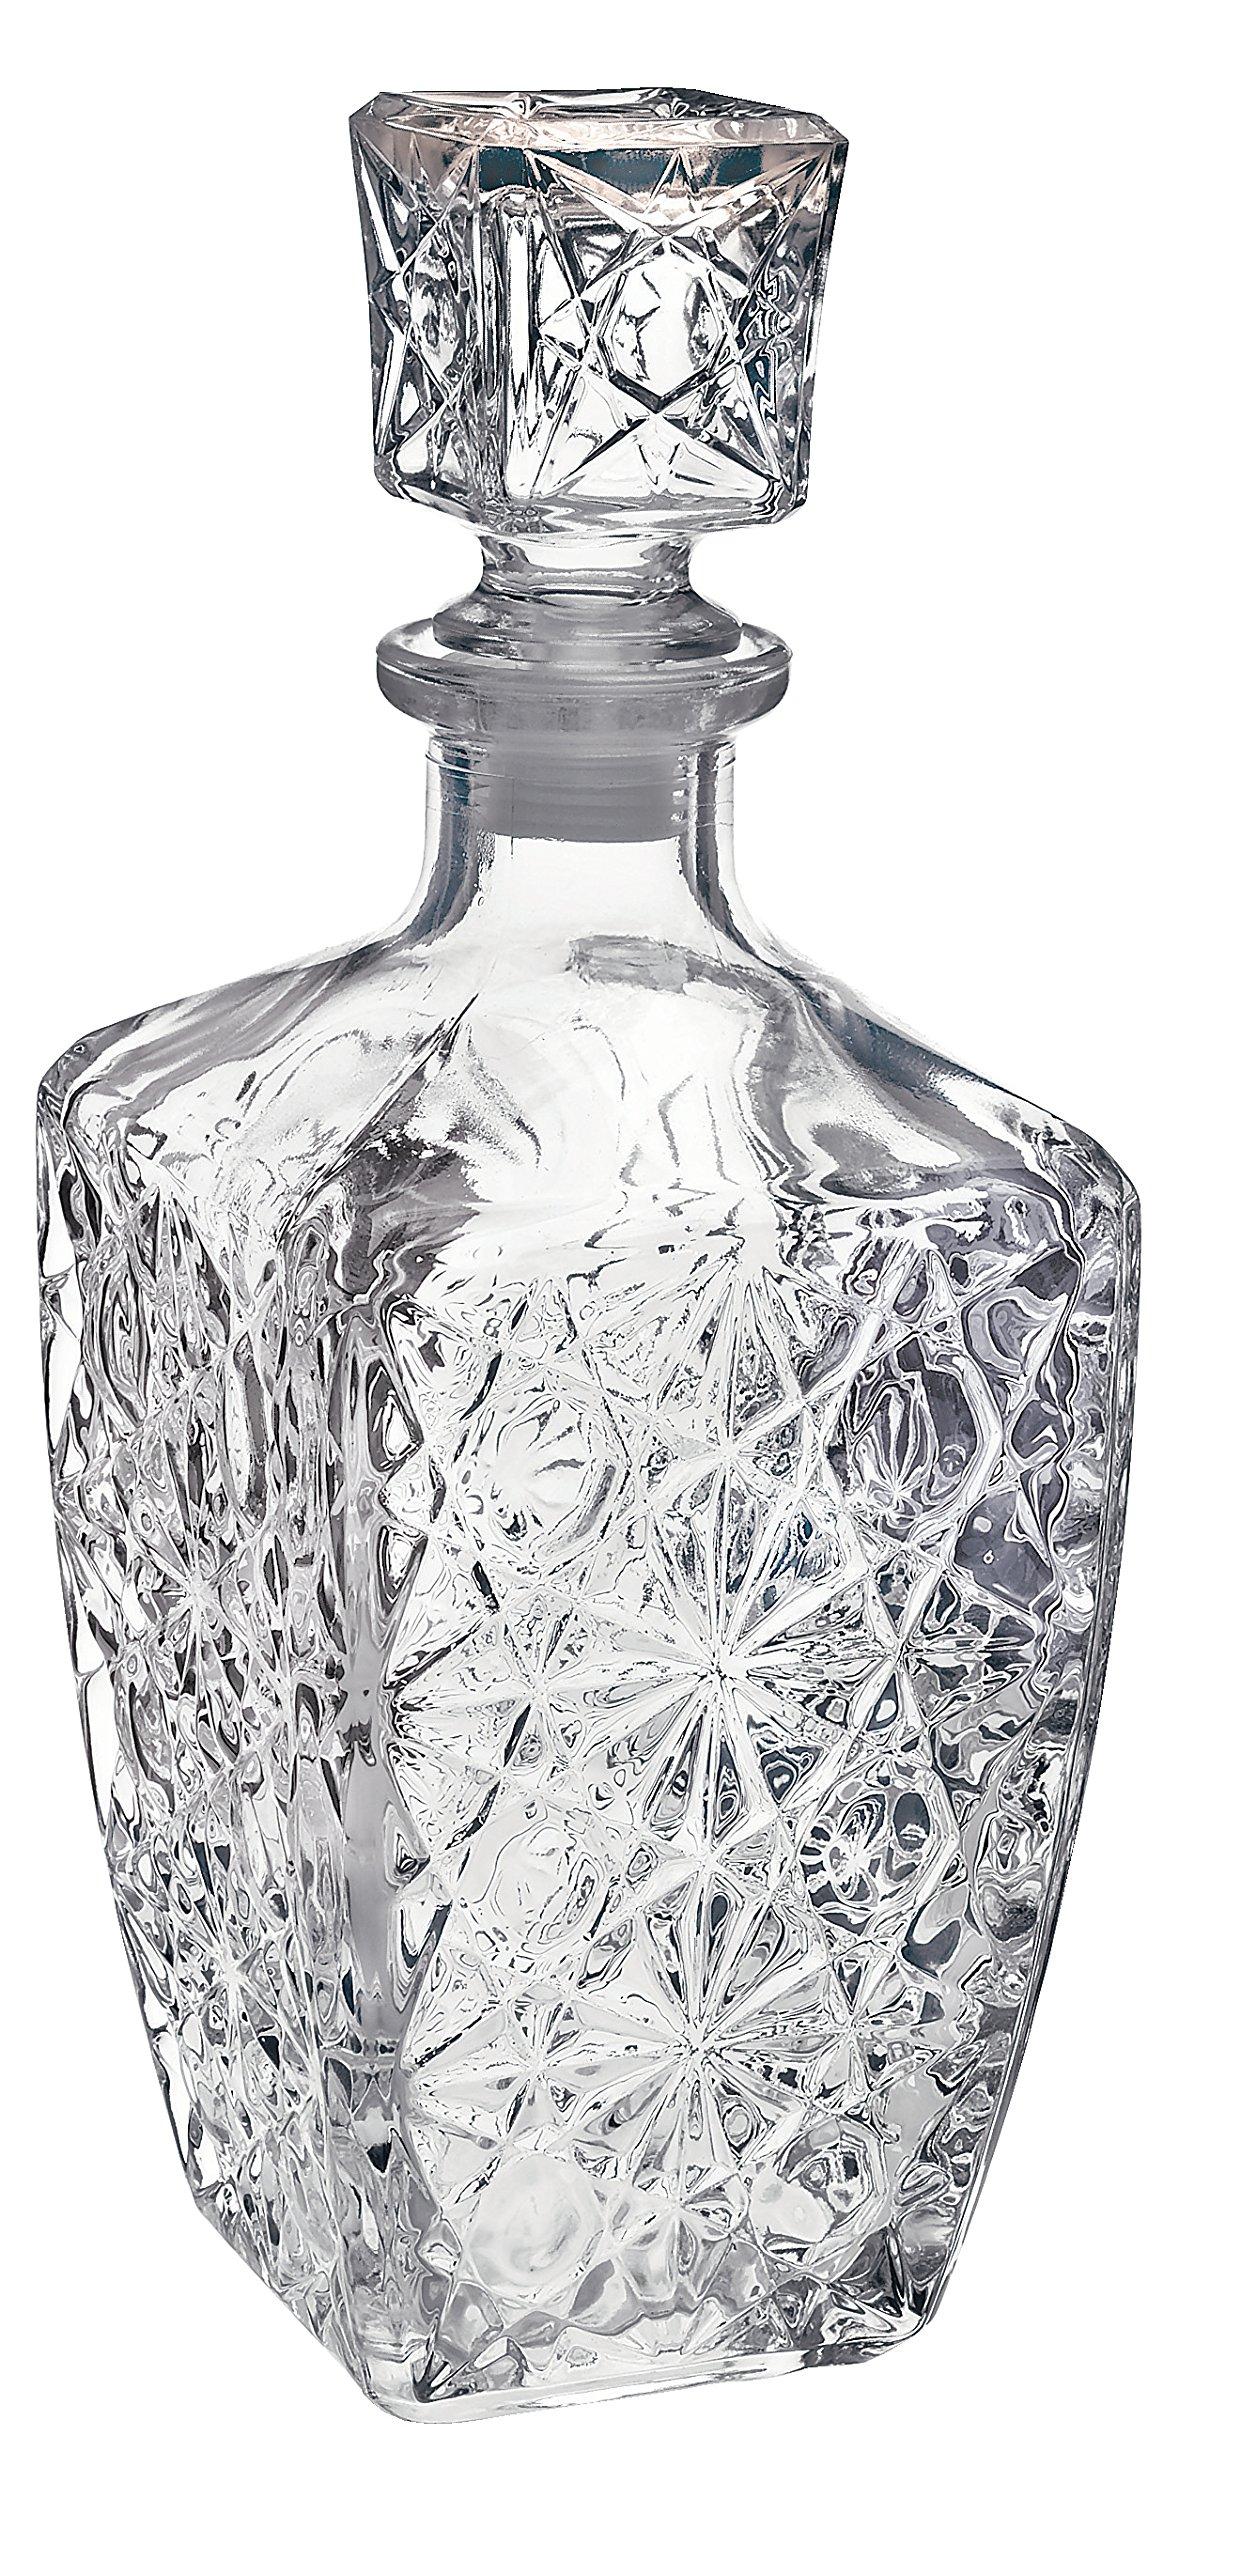 Bormioli Rocco Glass Decanter for Spirits, Dedalo (800ml/28oz)